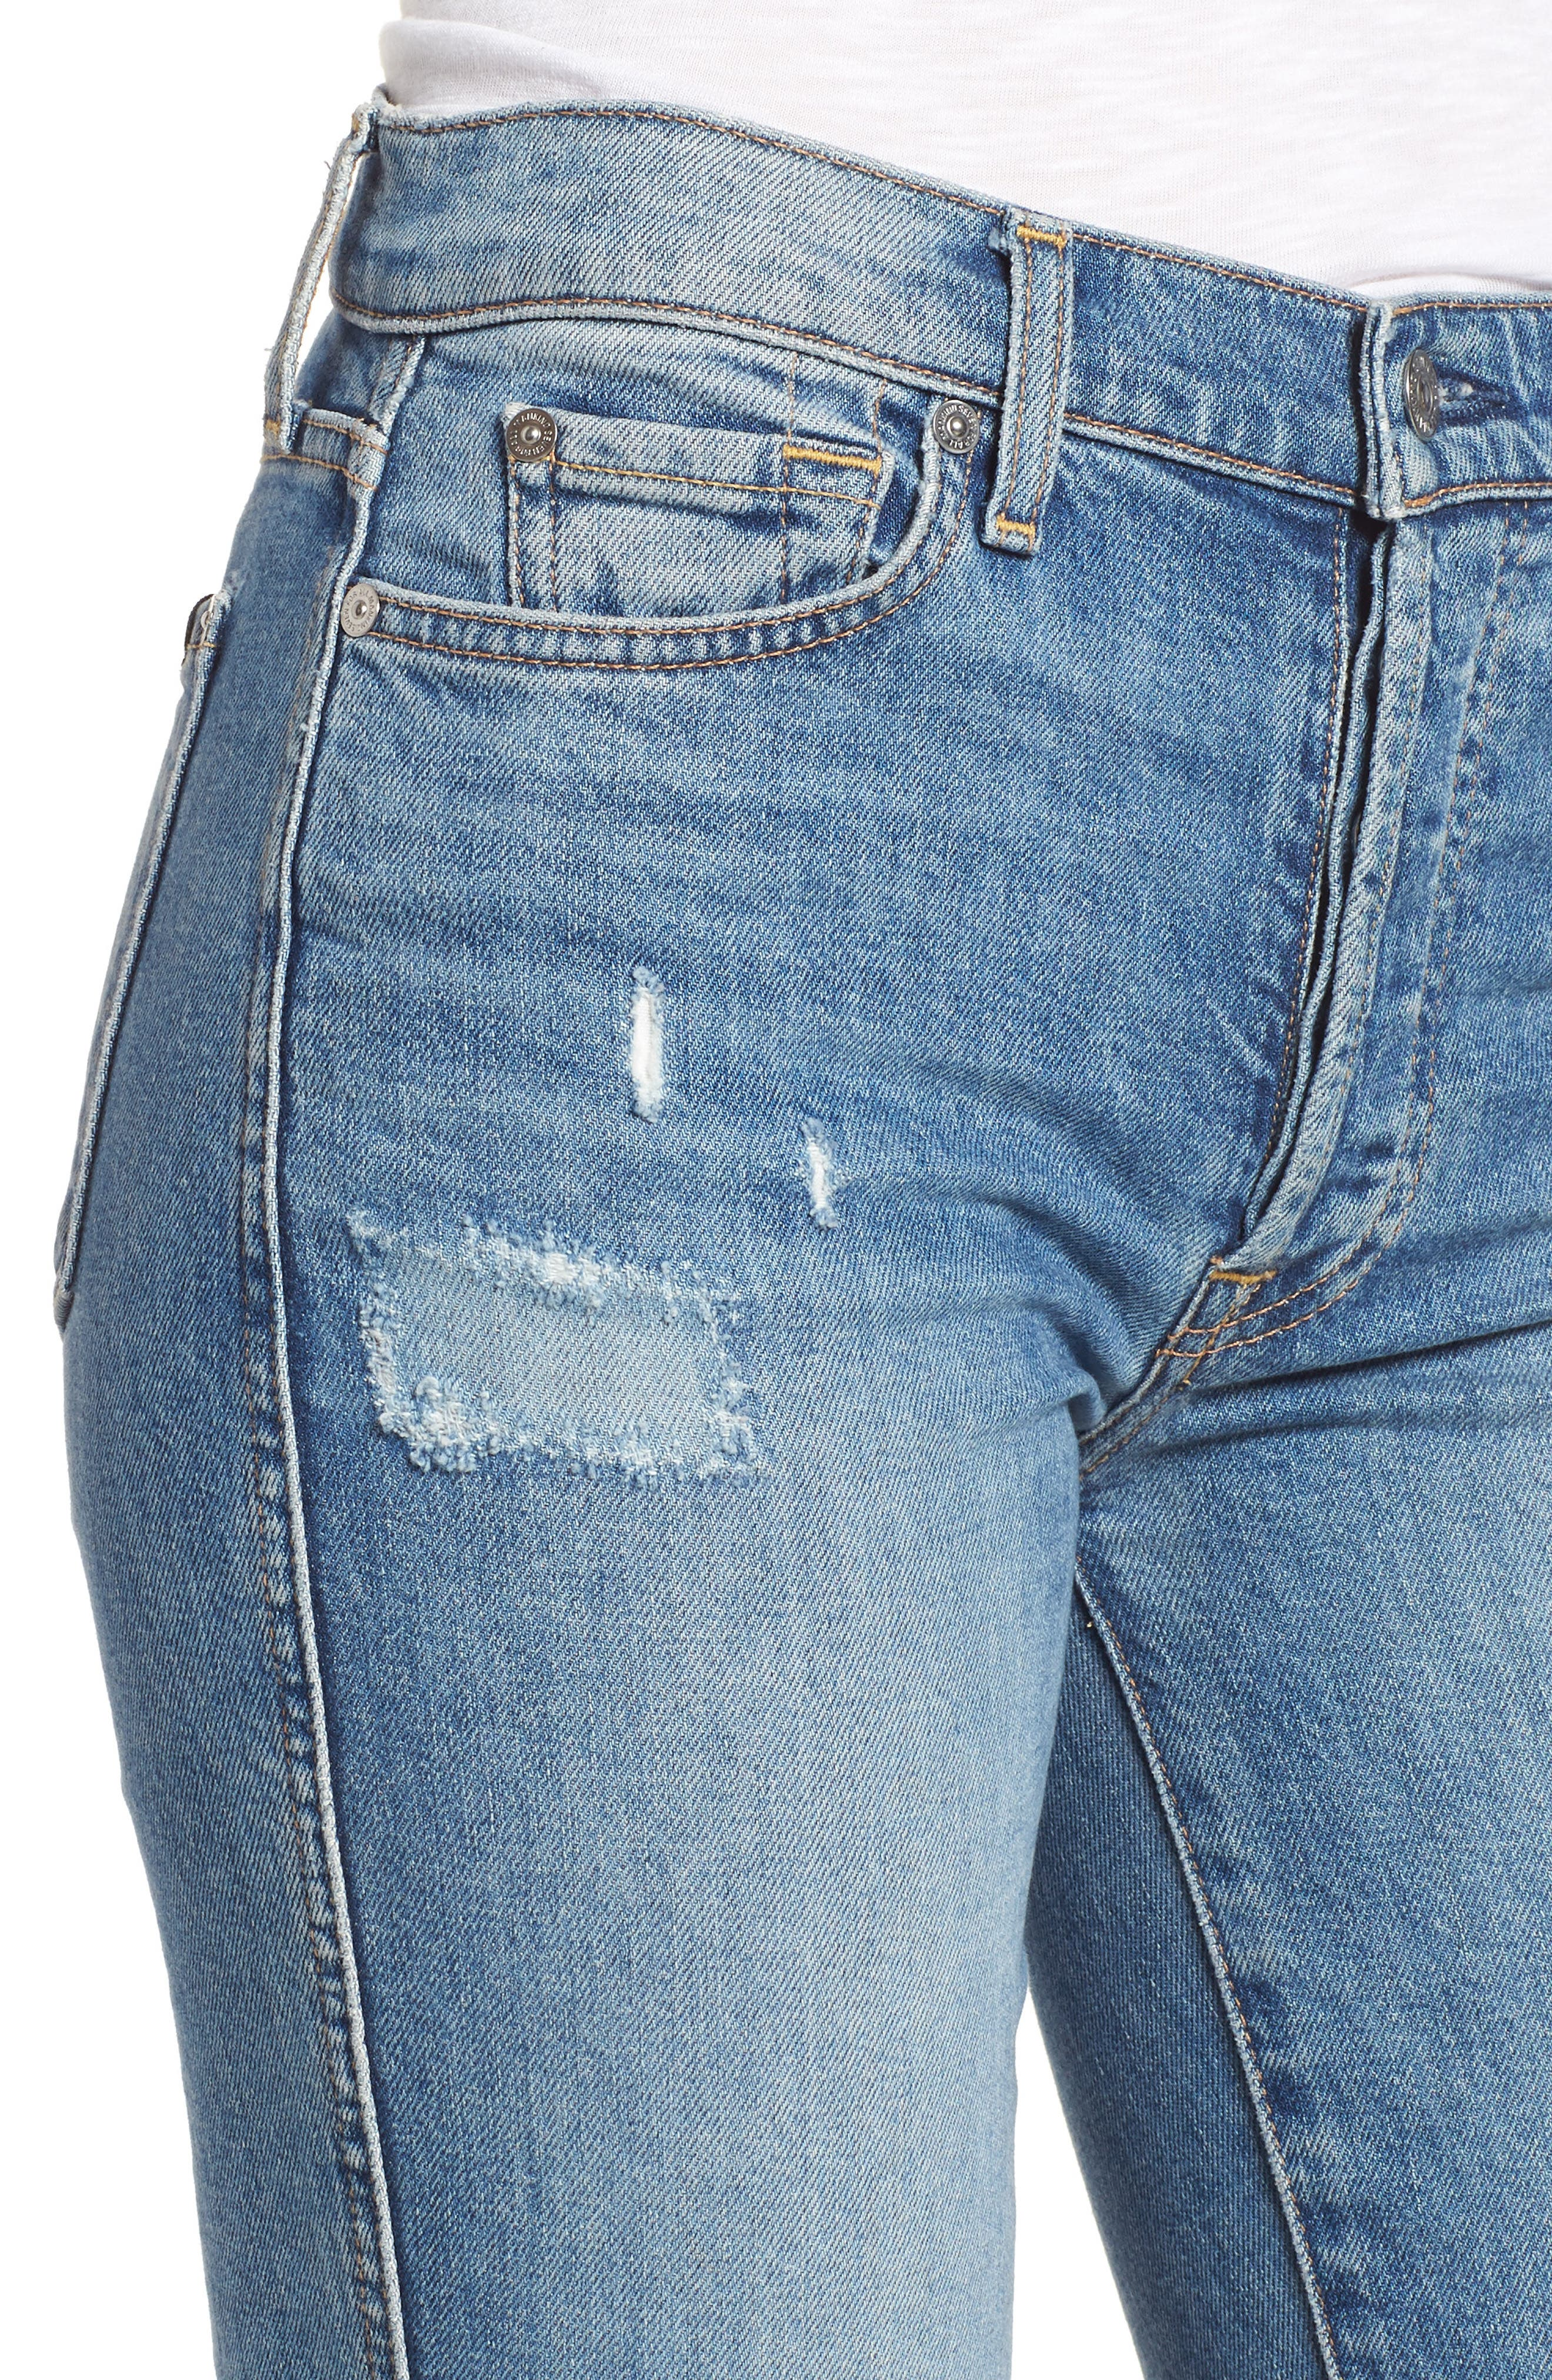 Edie High Waist Crop Straight Leg Jeans,                             Alternate thumbnail 17, color,